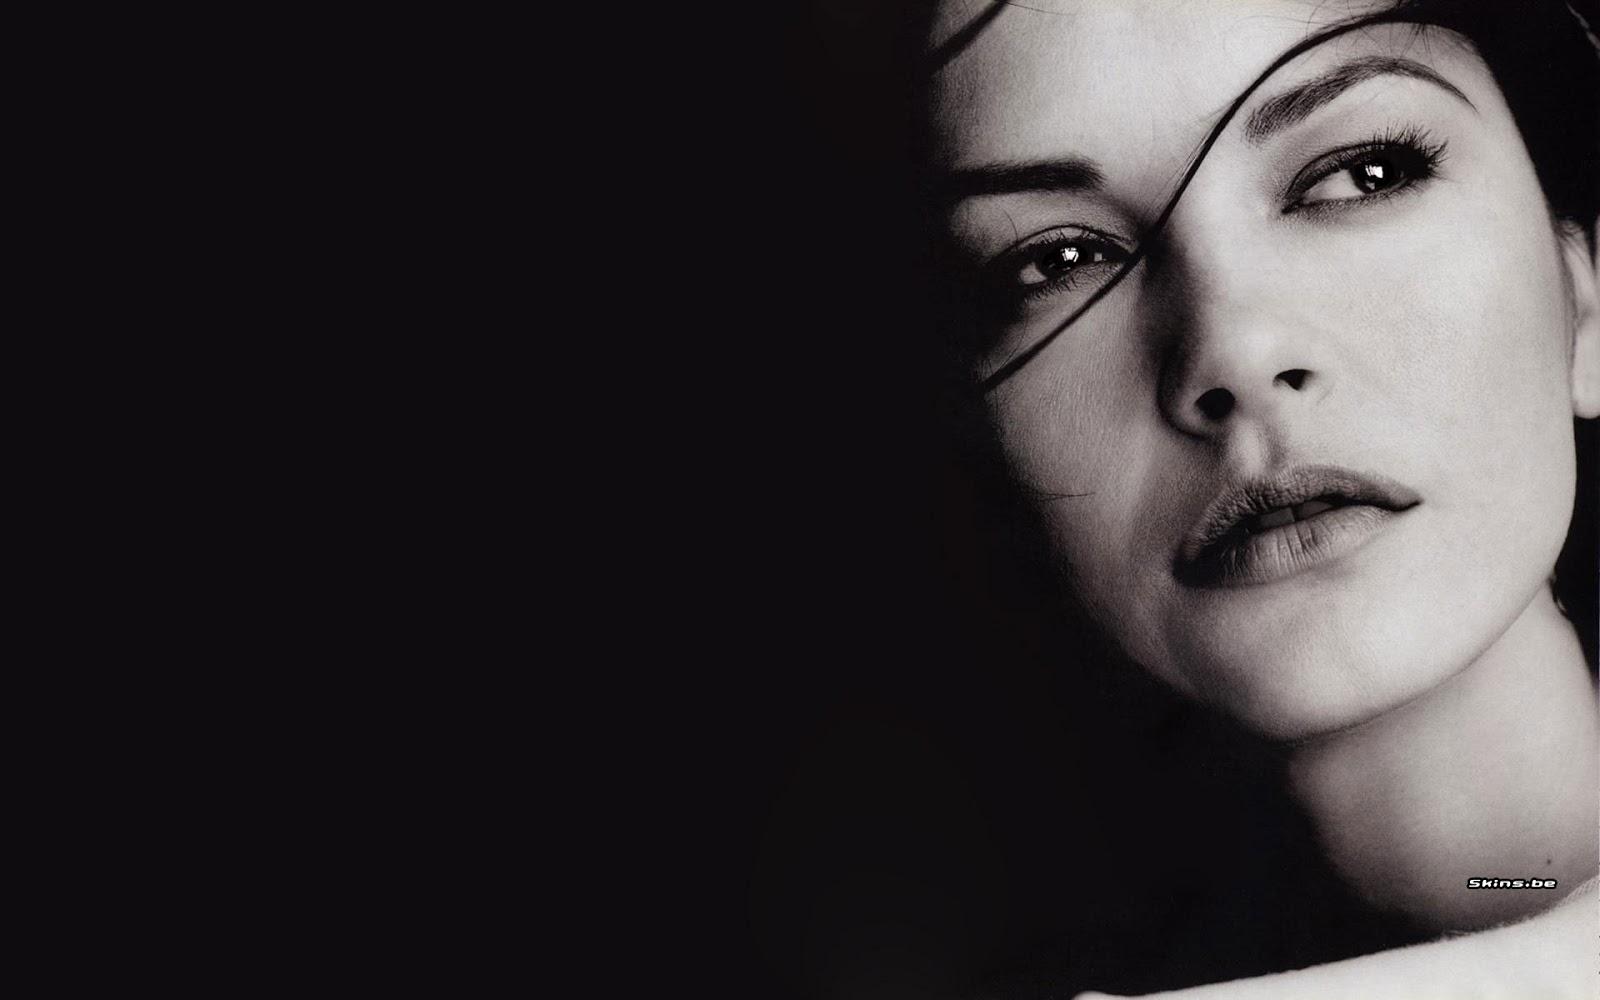 zeta jones catherine zeta jones catherine zeta jones catherine zeta ... Catherine Zeta Jones